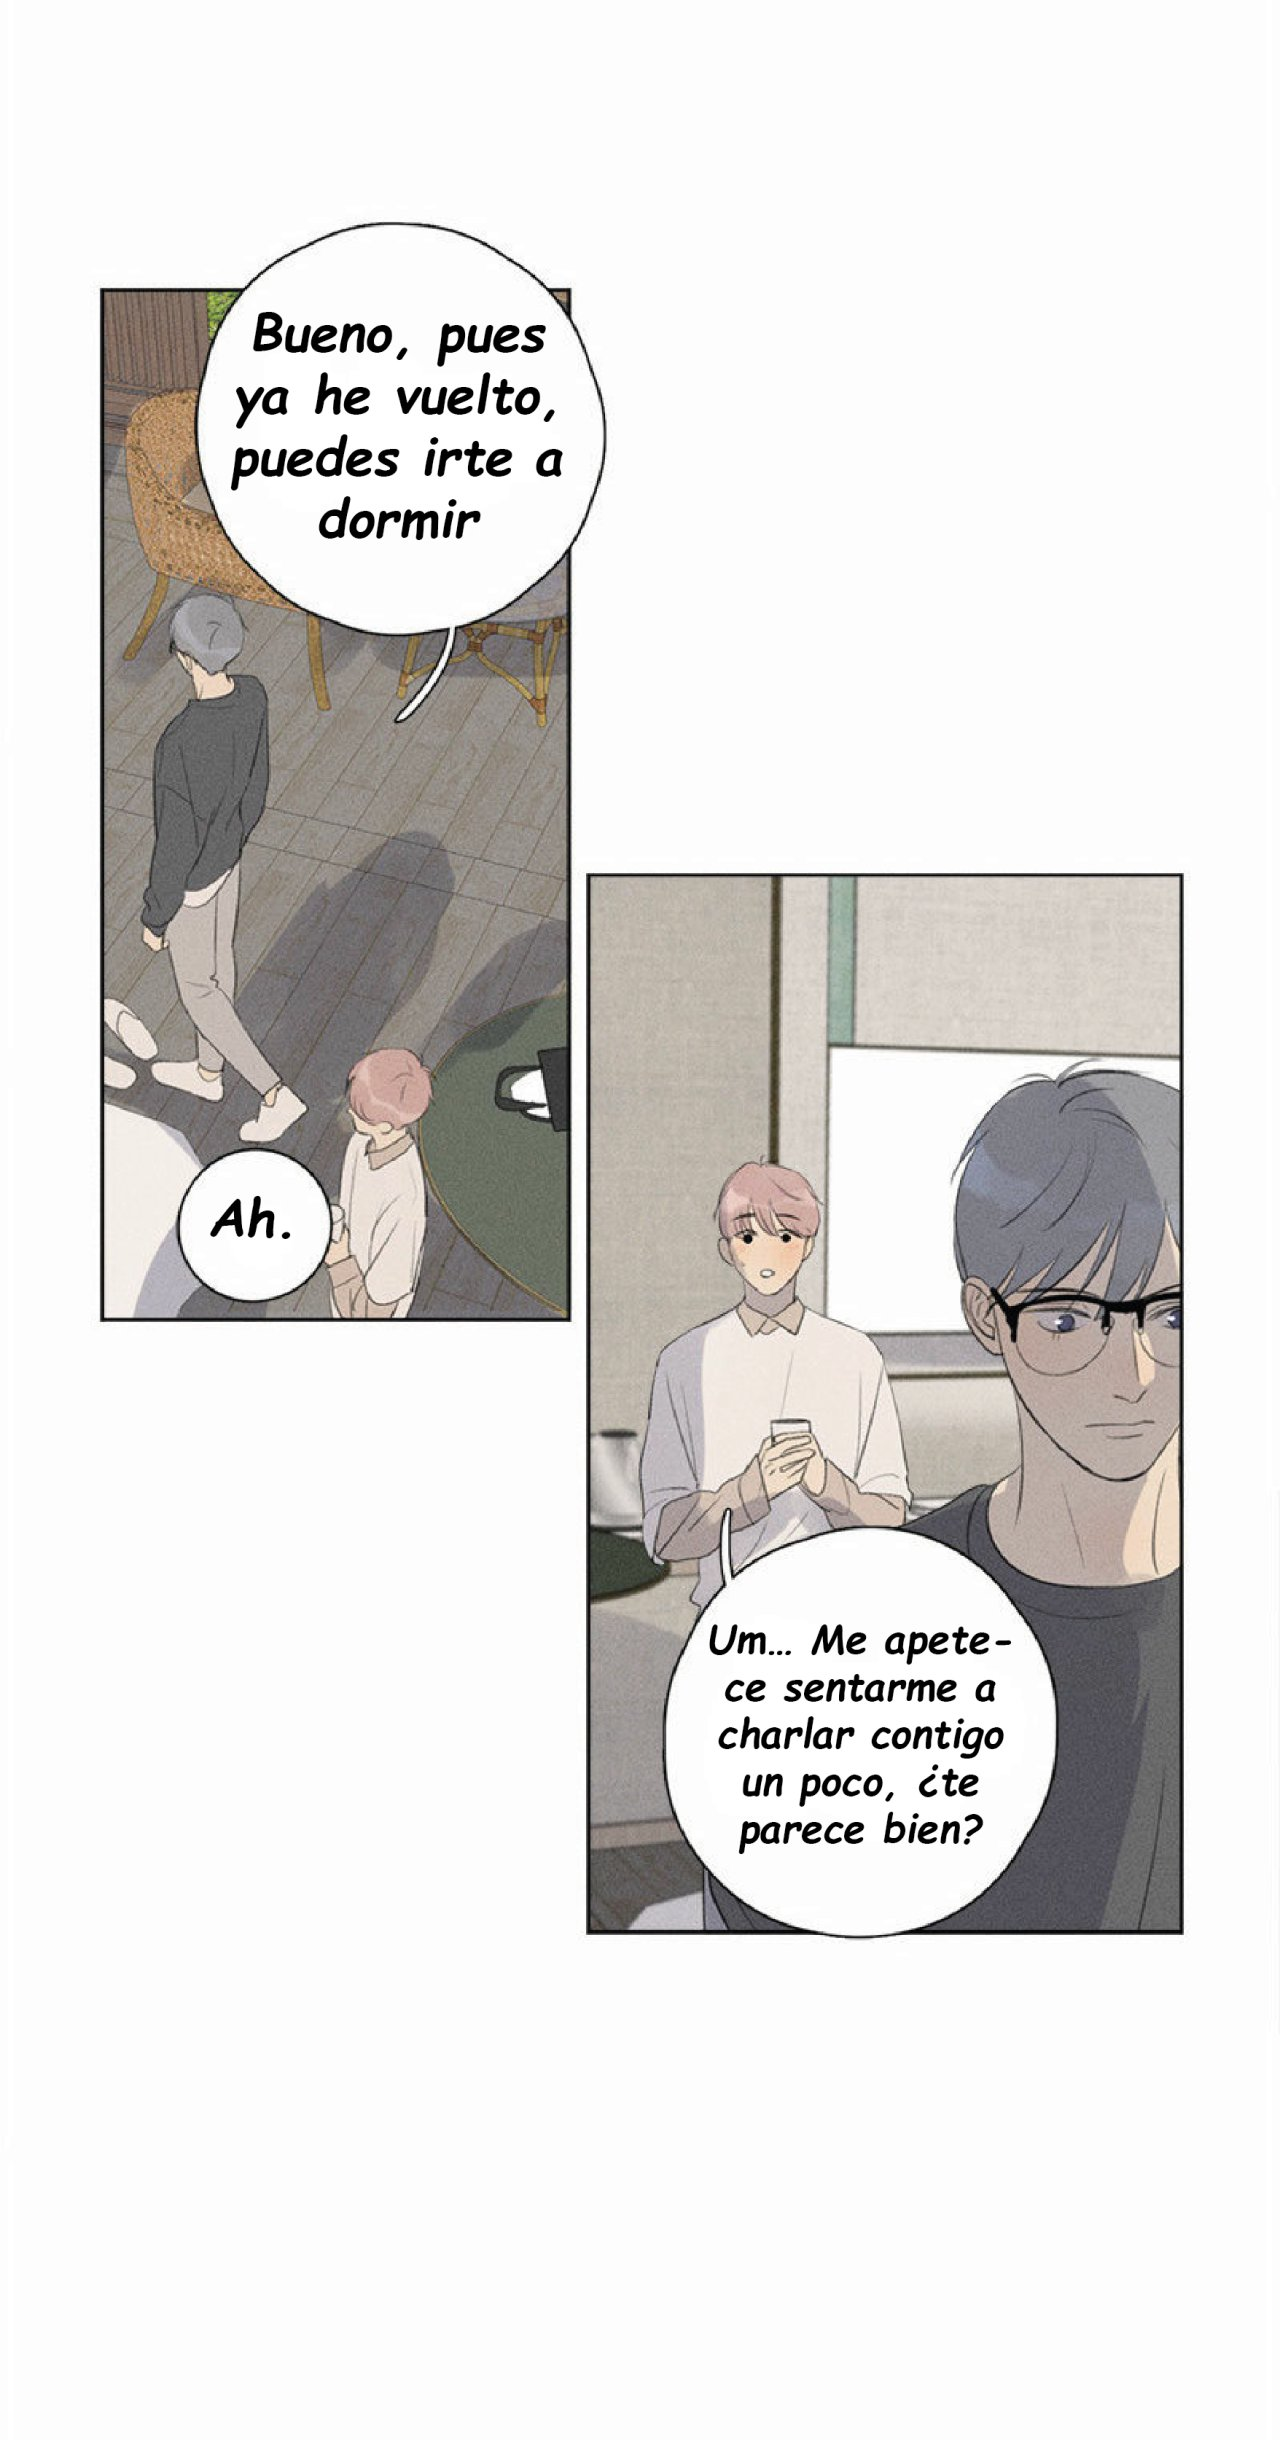 https://nine.mangadogs.com/es_manga/pic8/29/24925/957375/d24110aad582c07b5b3c8a978dd167c6.jpg Page 20